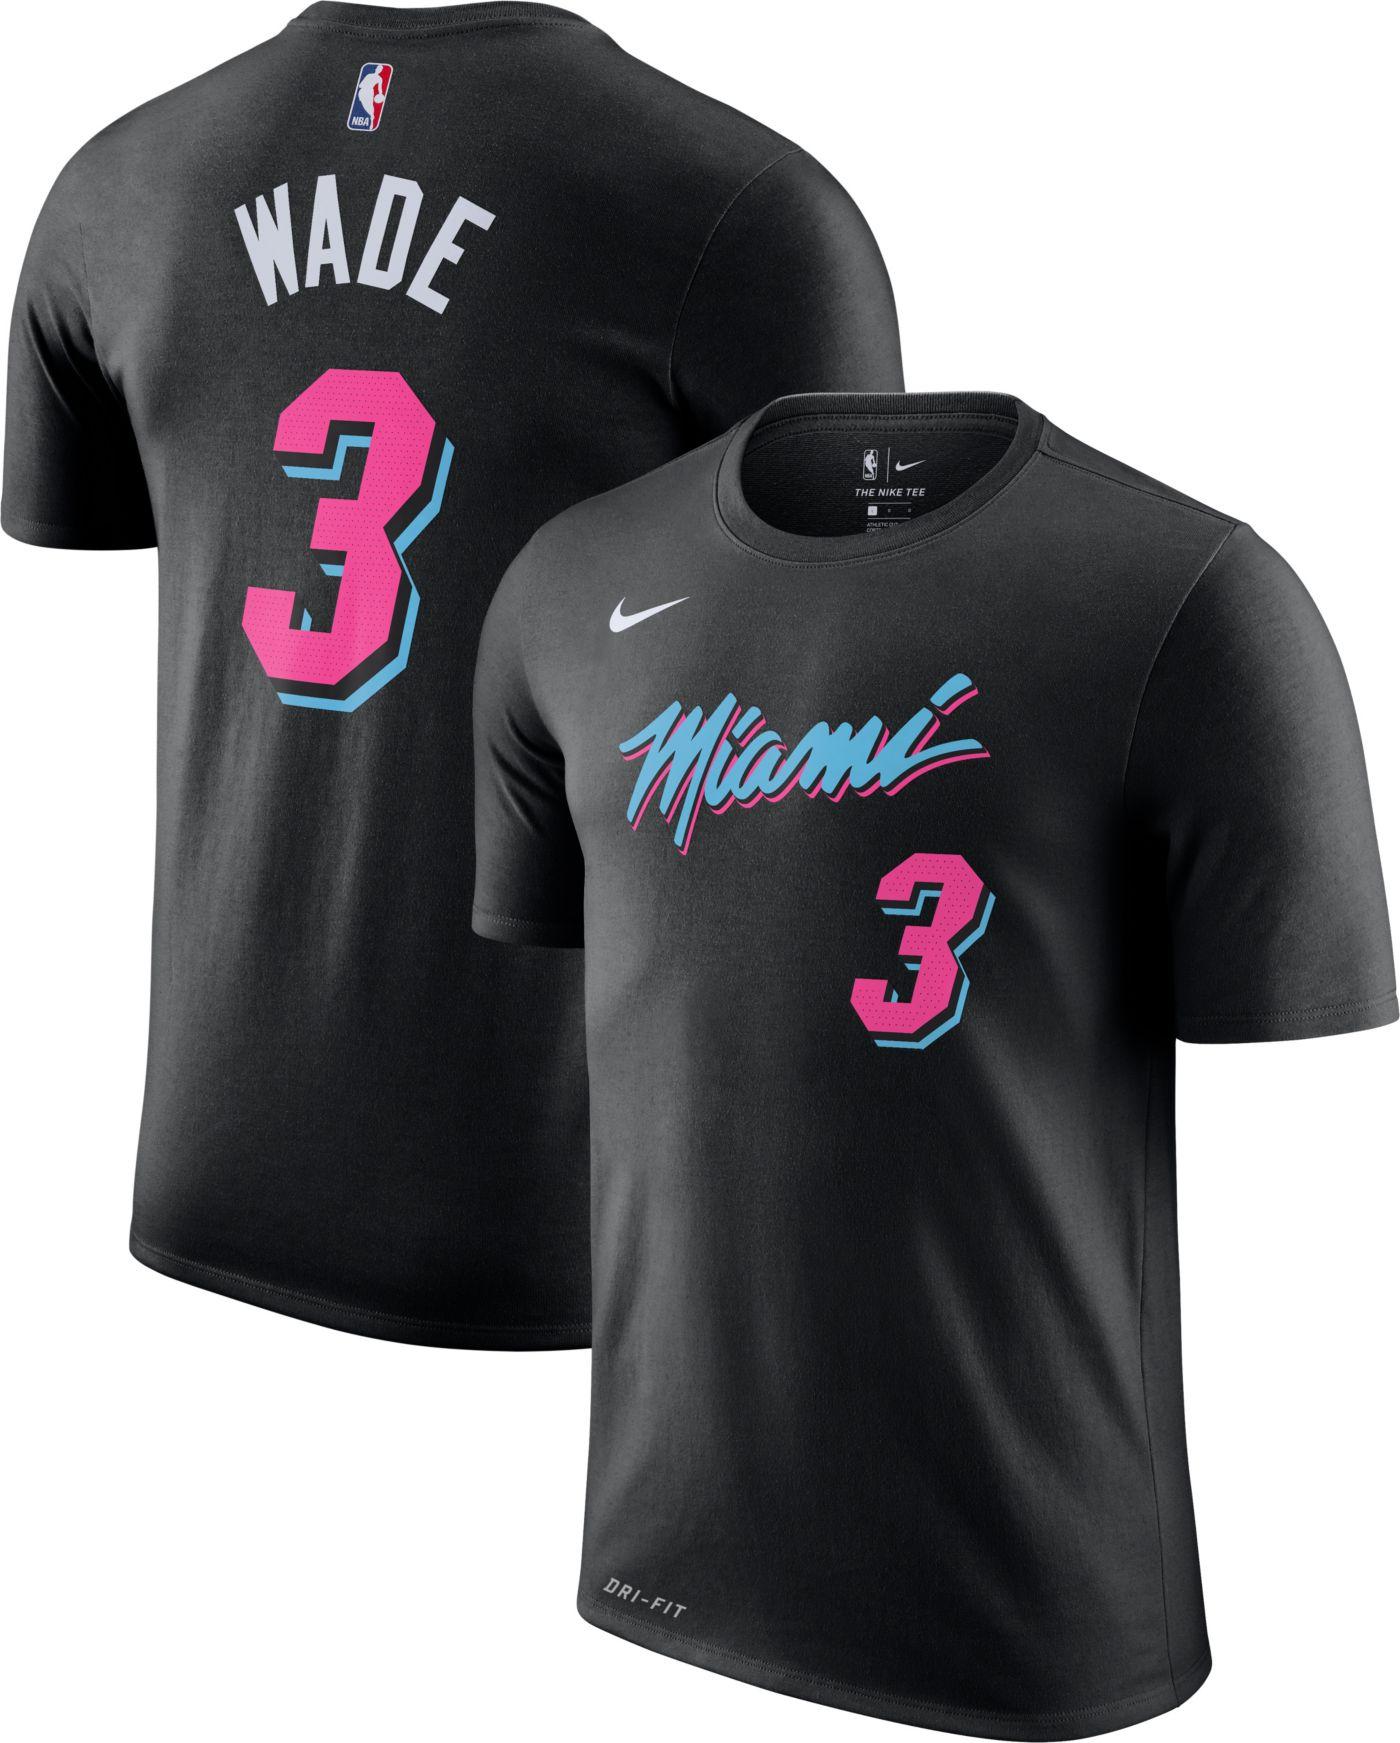 Nike Men's Miami Heat Dwyane Wade Dri-FIT City Edition T-Shirt